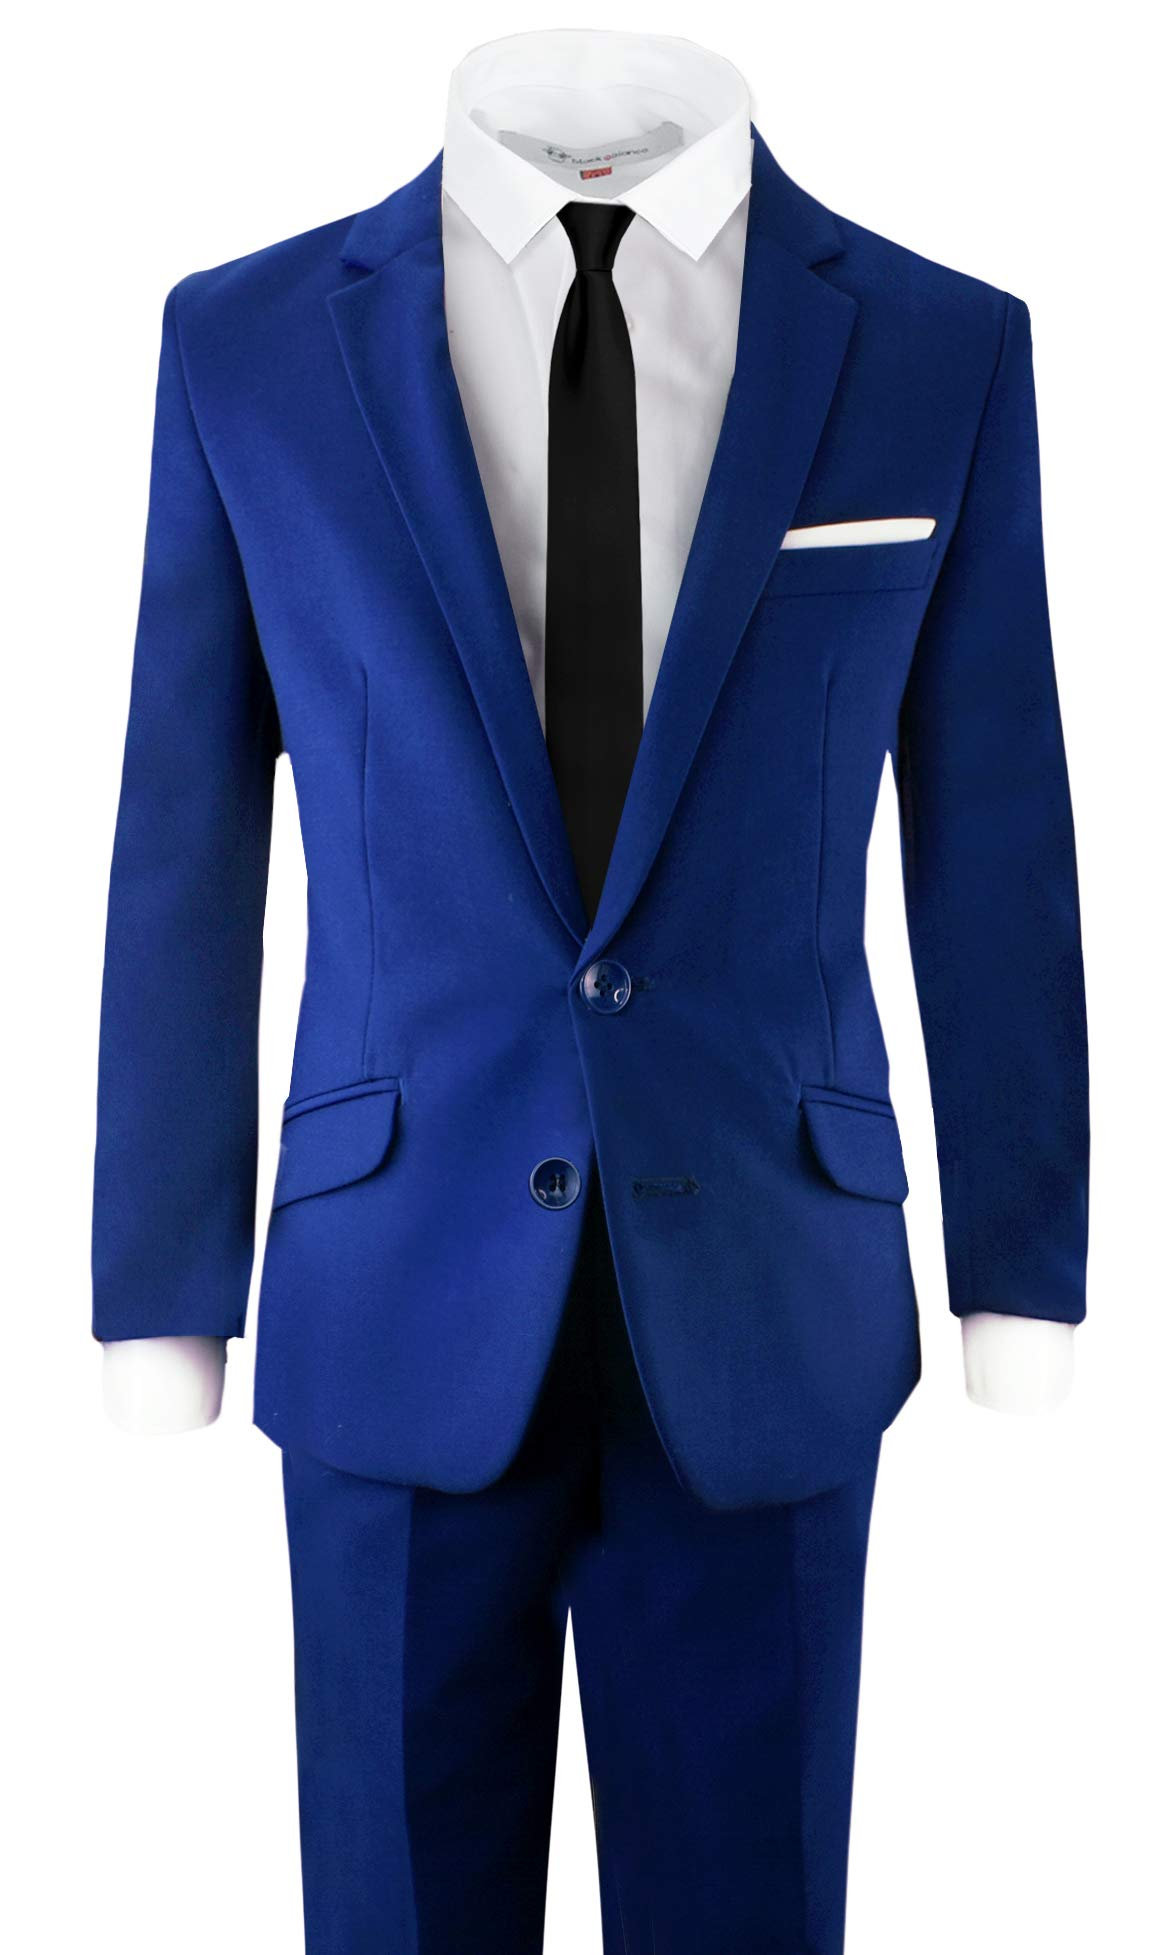 Black n Bianco Signature Boys' Slim Fit Suit Complete Outfit (7, Blue)